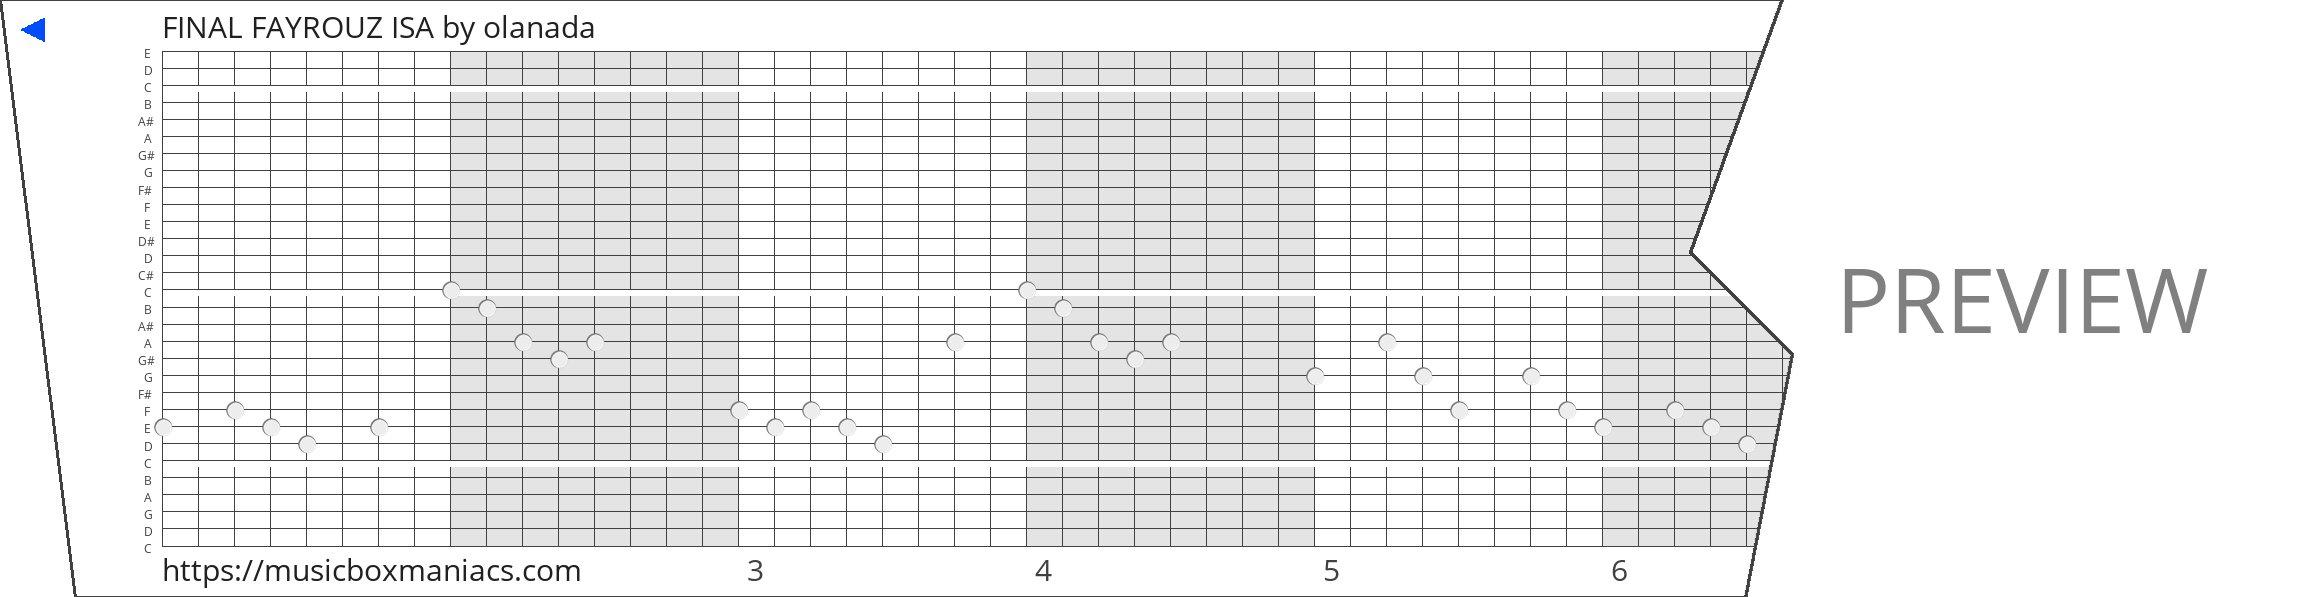 FINAL FAYROUZ ISA 30 note music box paper strip